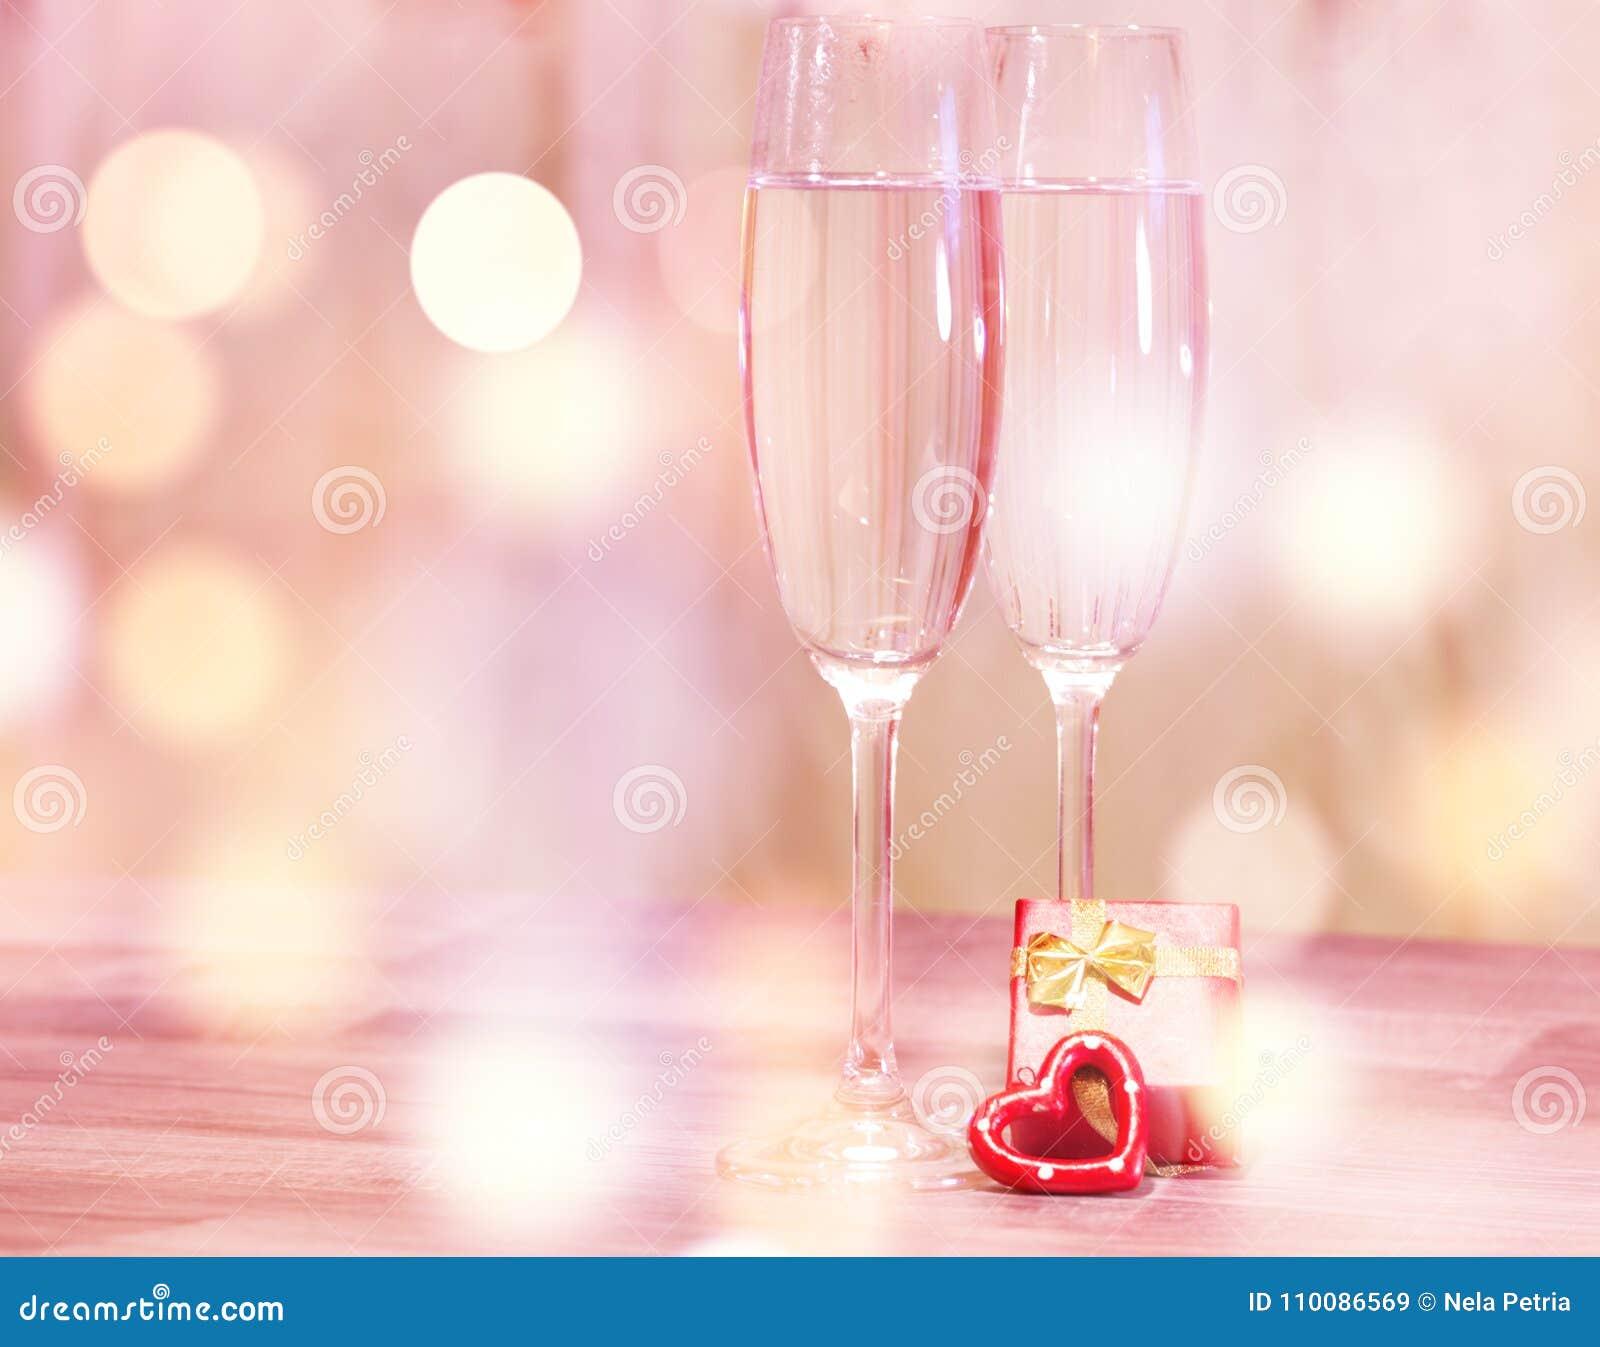 Wedding champagne glasses, romantic heart background